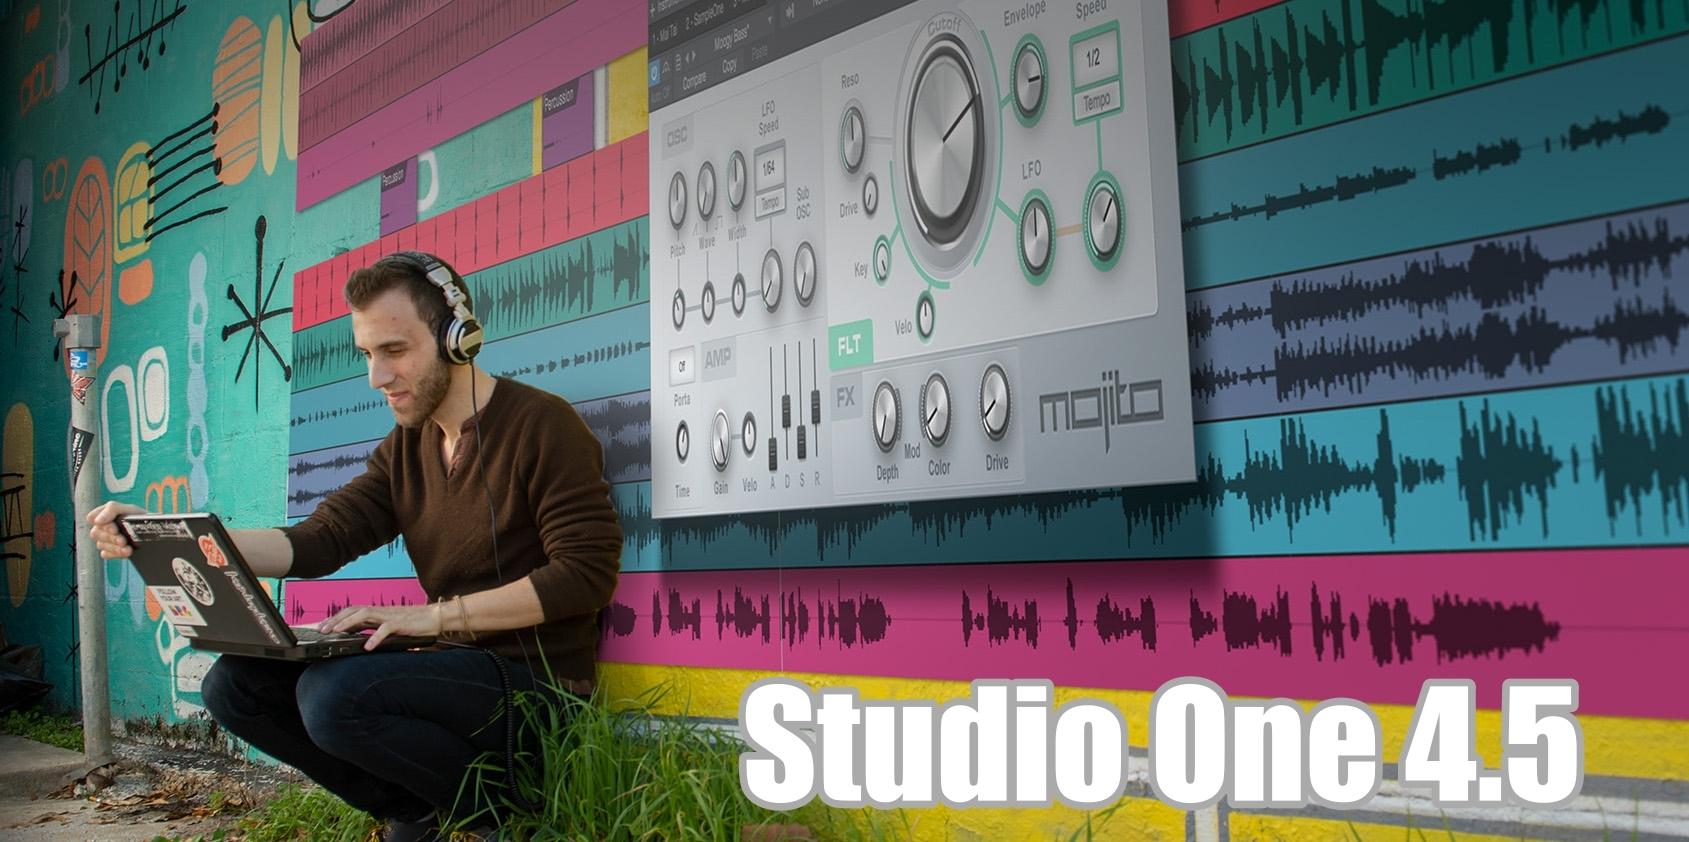 Studio one mediabar02